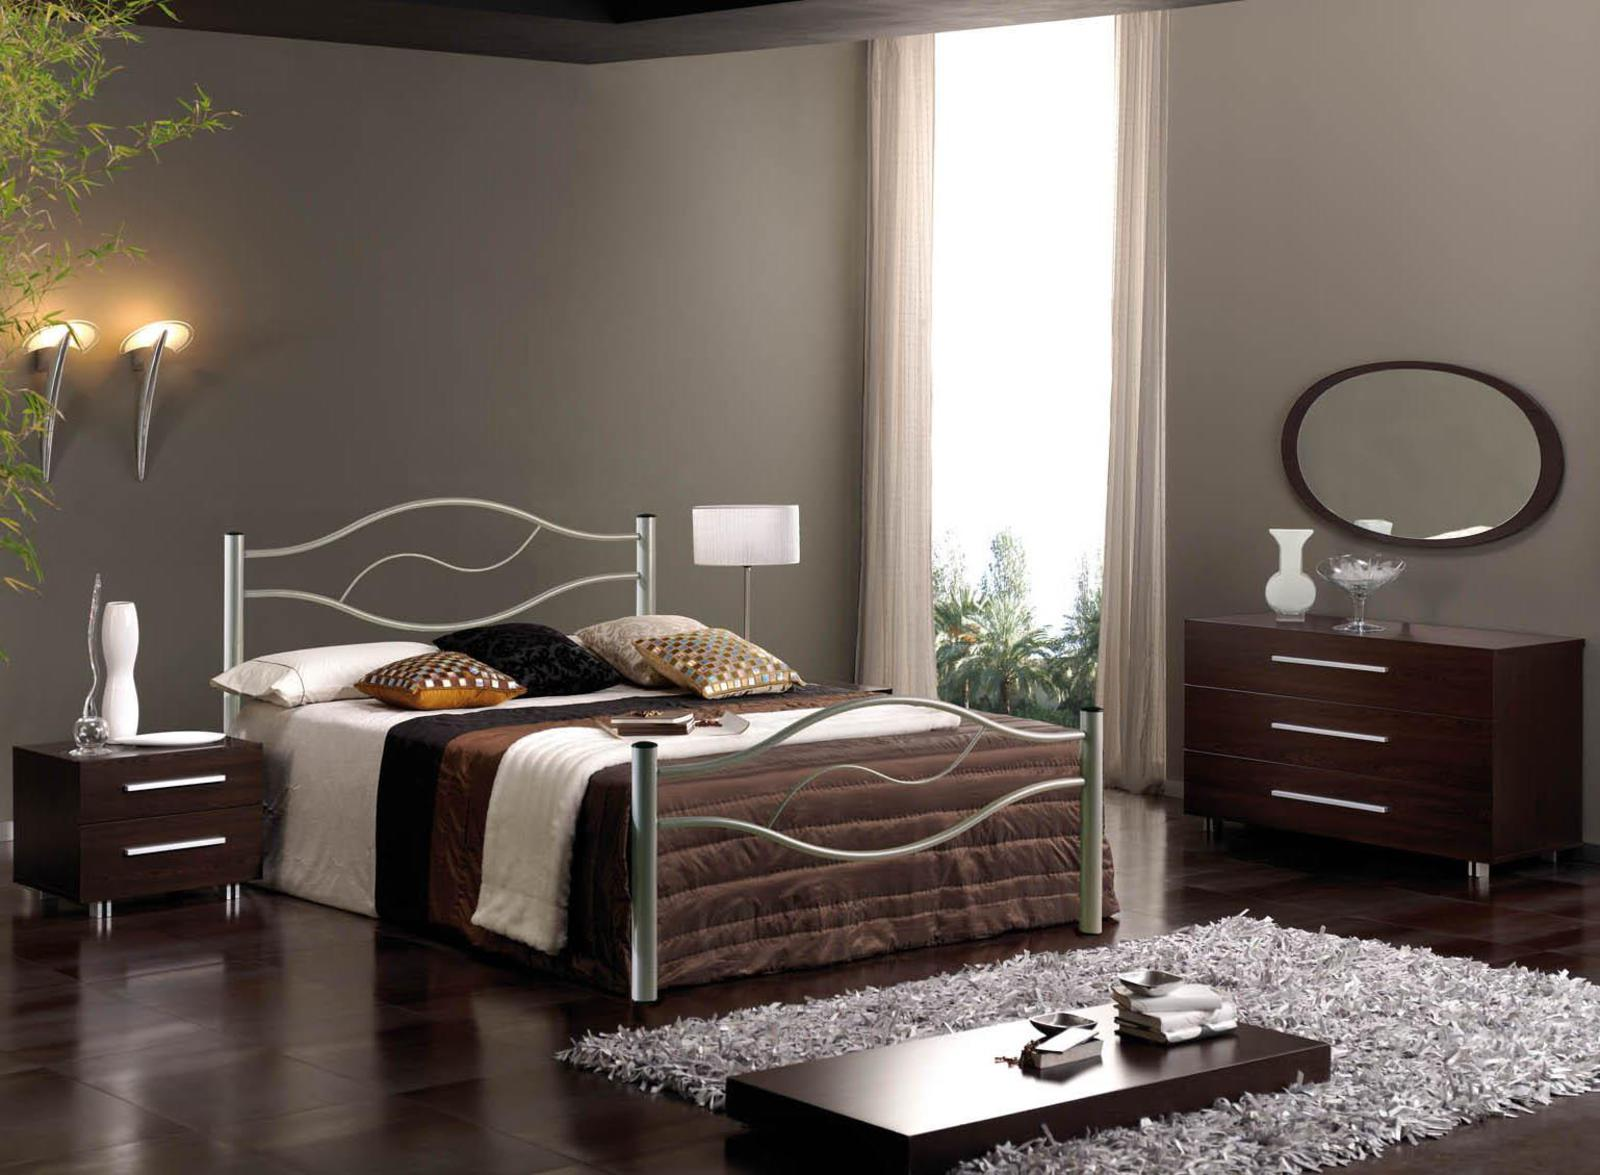 amazingdecoration-net-deko-wp-content-uploads-2012-04-bedroom-furniture-contemporary-design-estrella-1